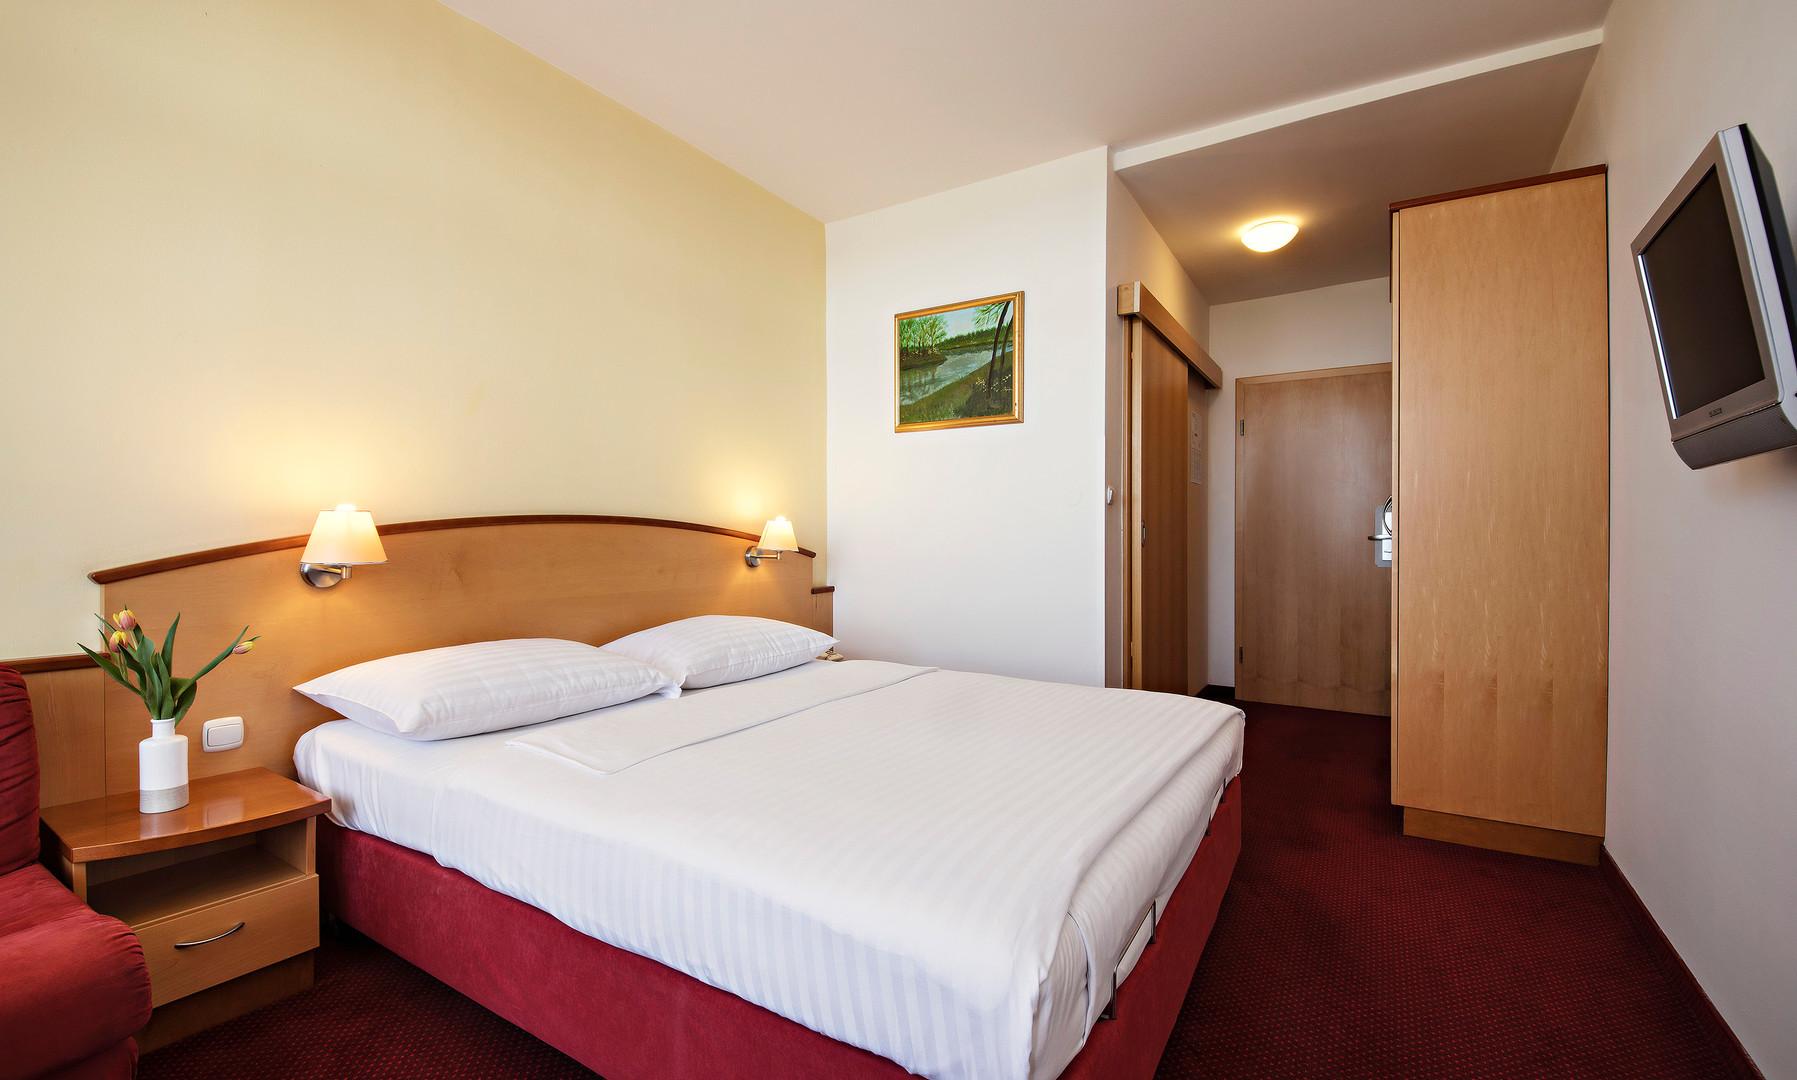 HotelLipa_doubleroom_02_052017_DD.jpg